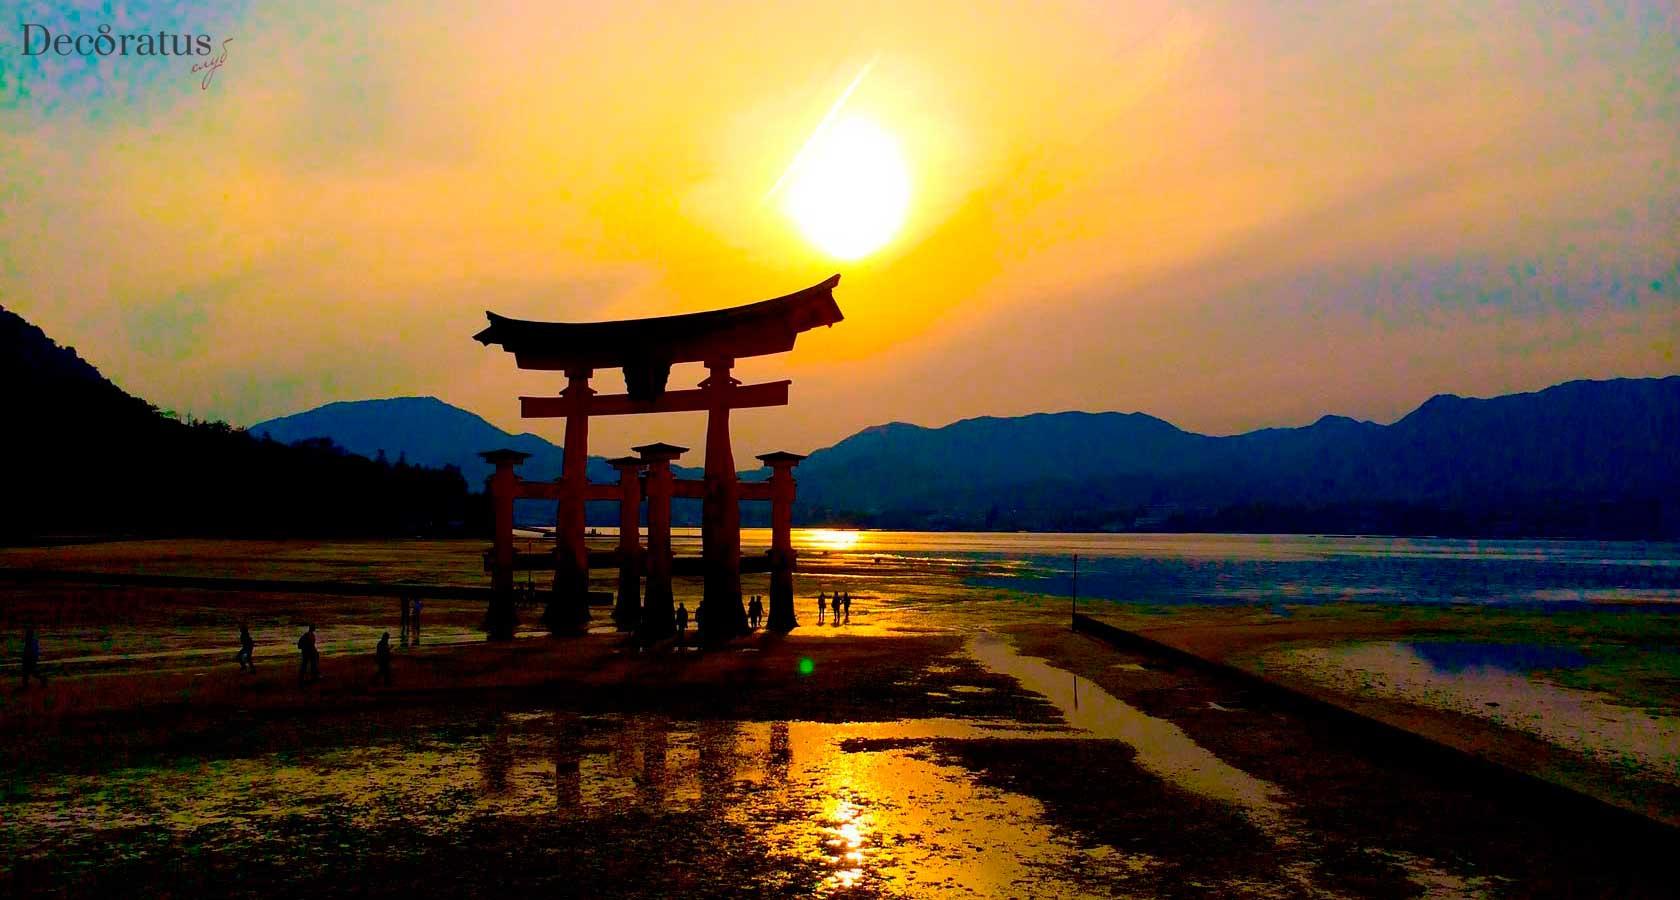 ворота тории святилища ицукусима в миядзиме в японии